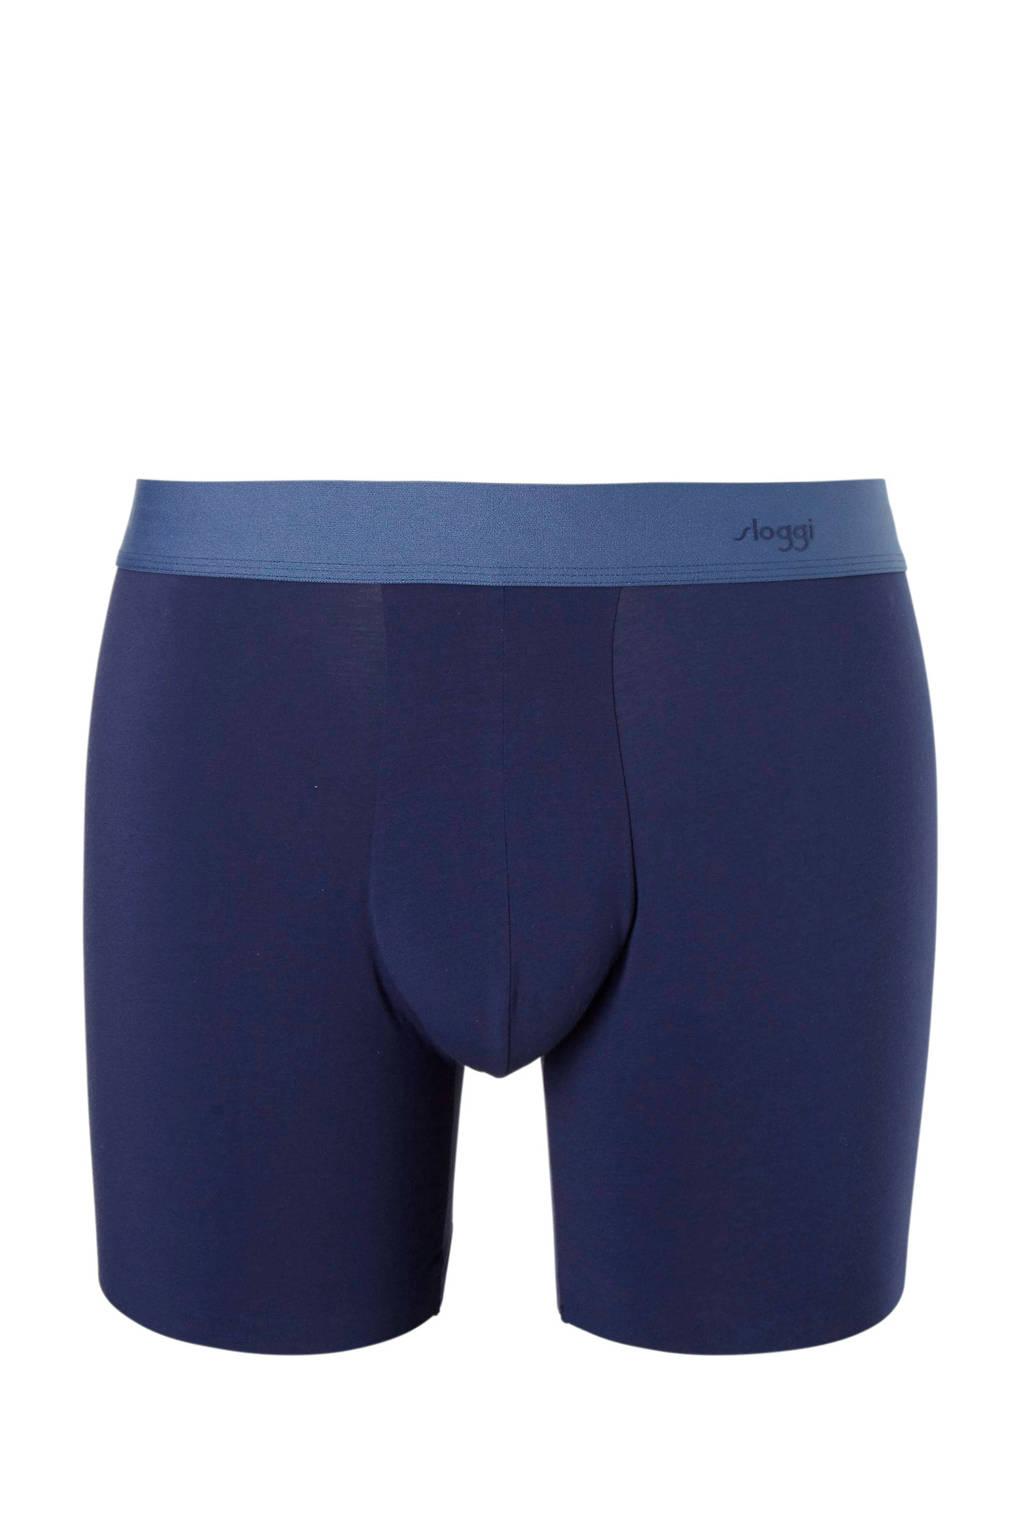 Sloggi Zero Feel boxershort donkerblauw, Donkerblauw